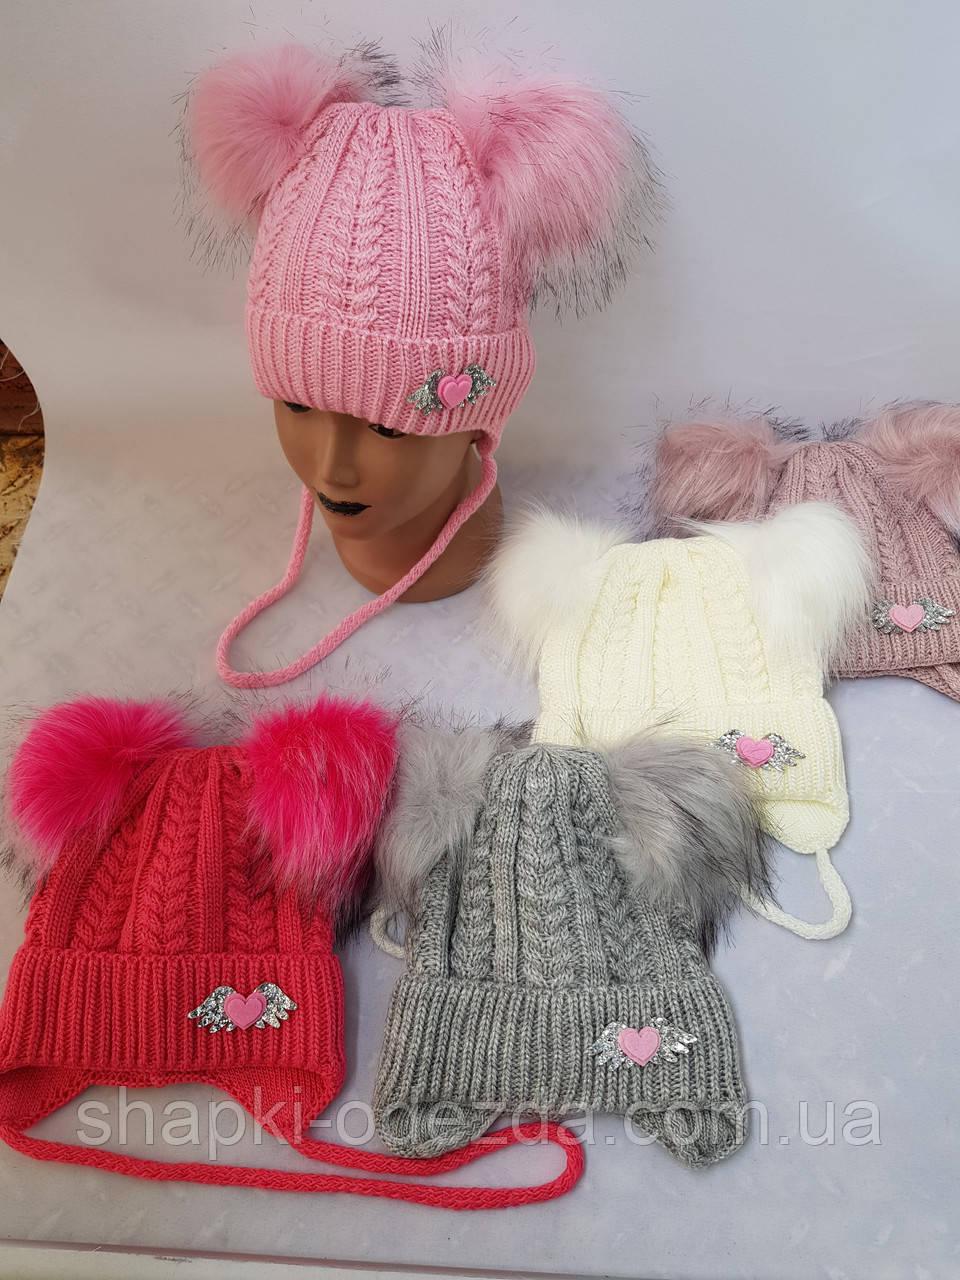 Шапка зимняя для девочки на флисе  р 44-48 оптом ( Д 548 )